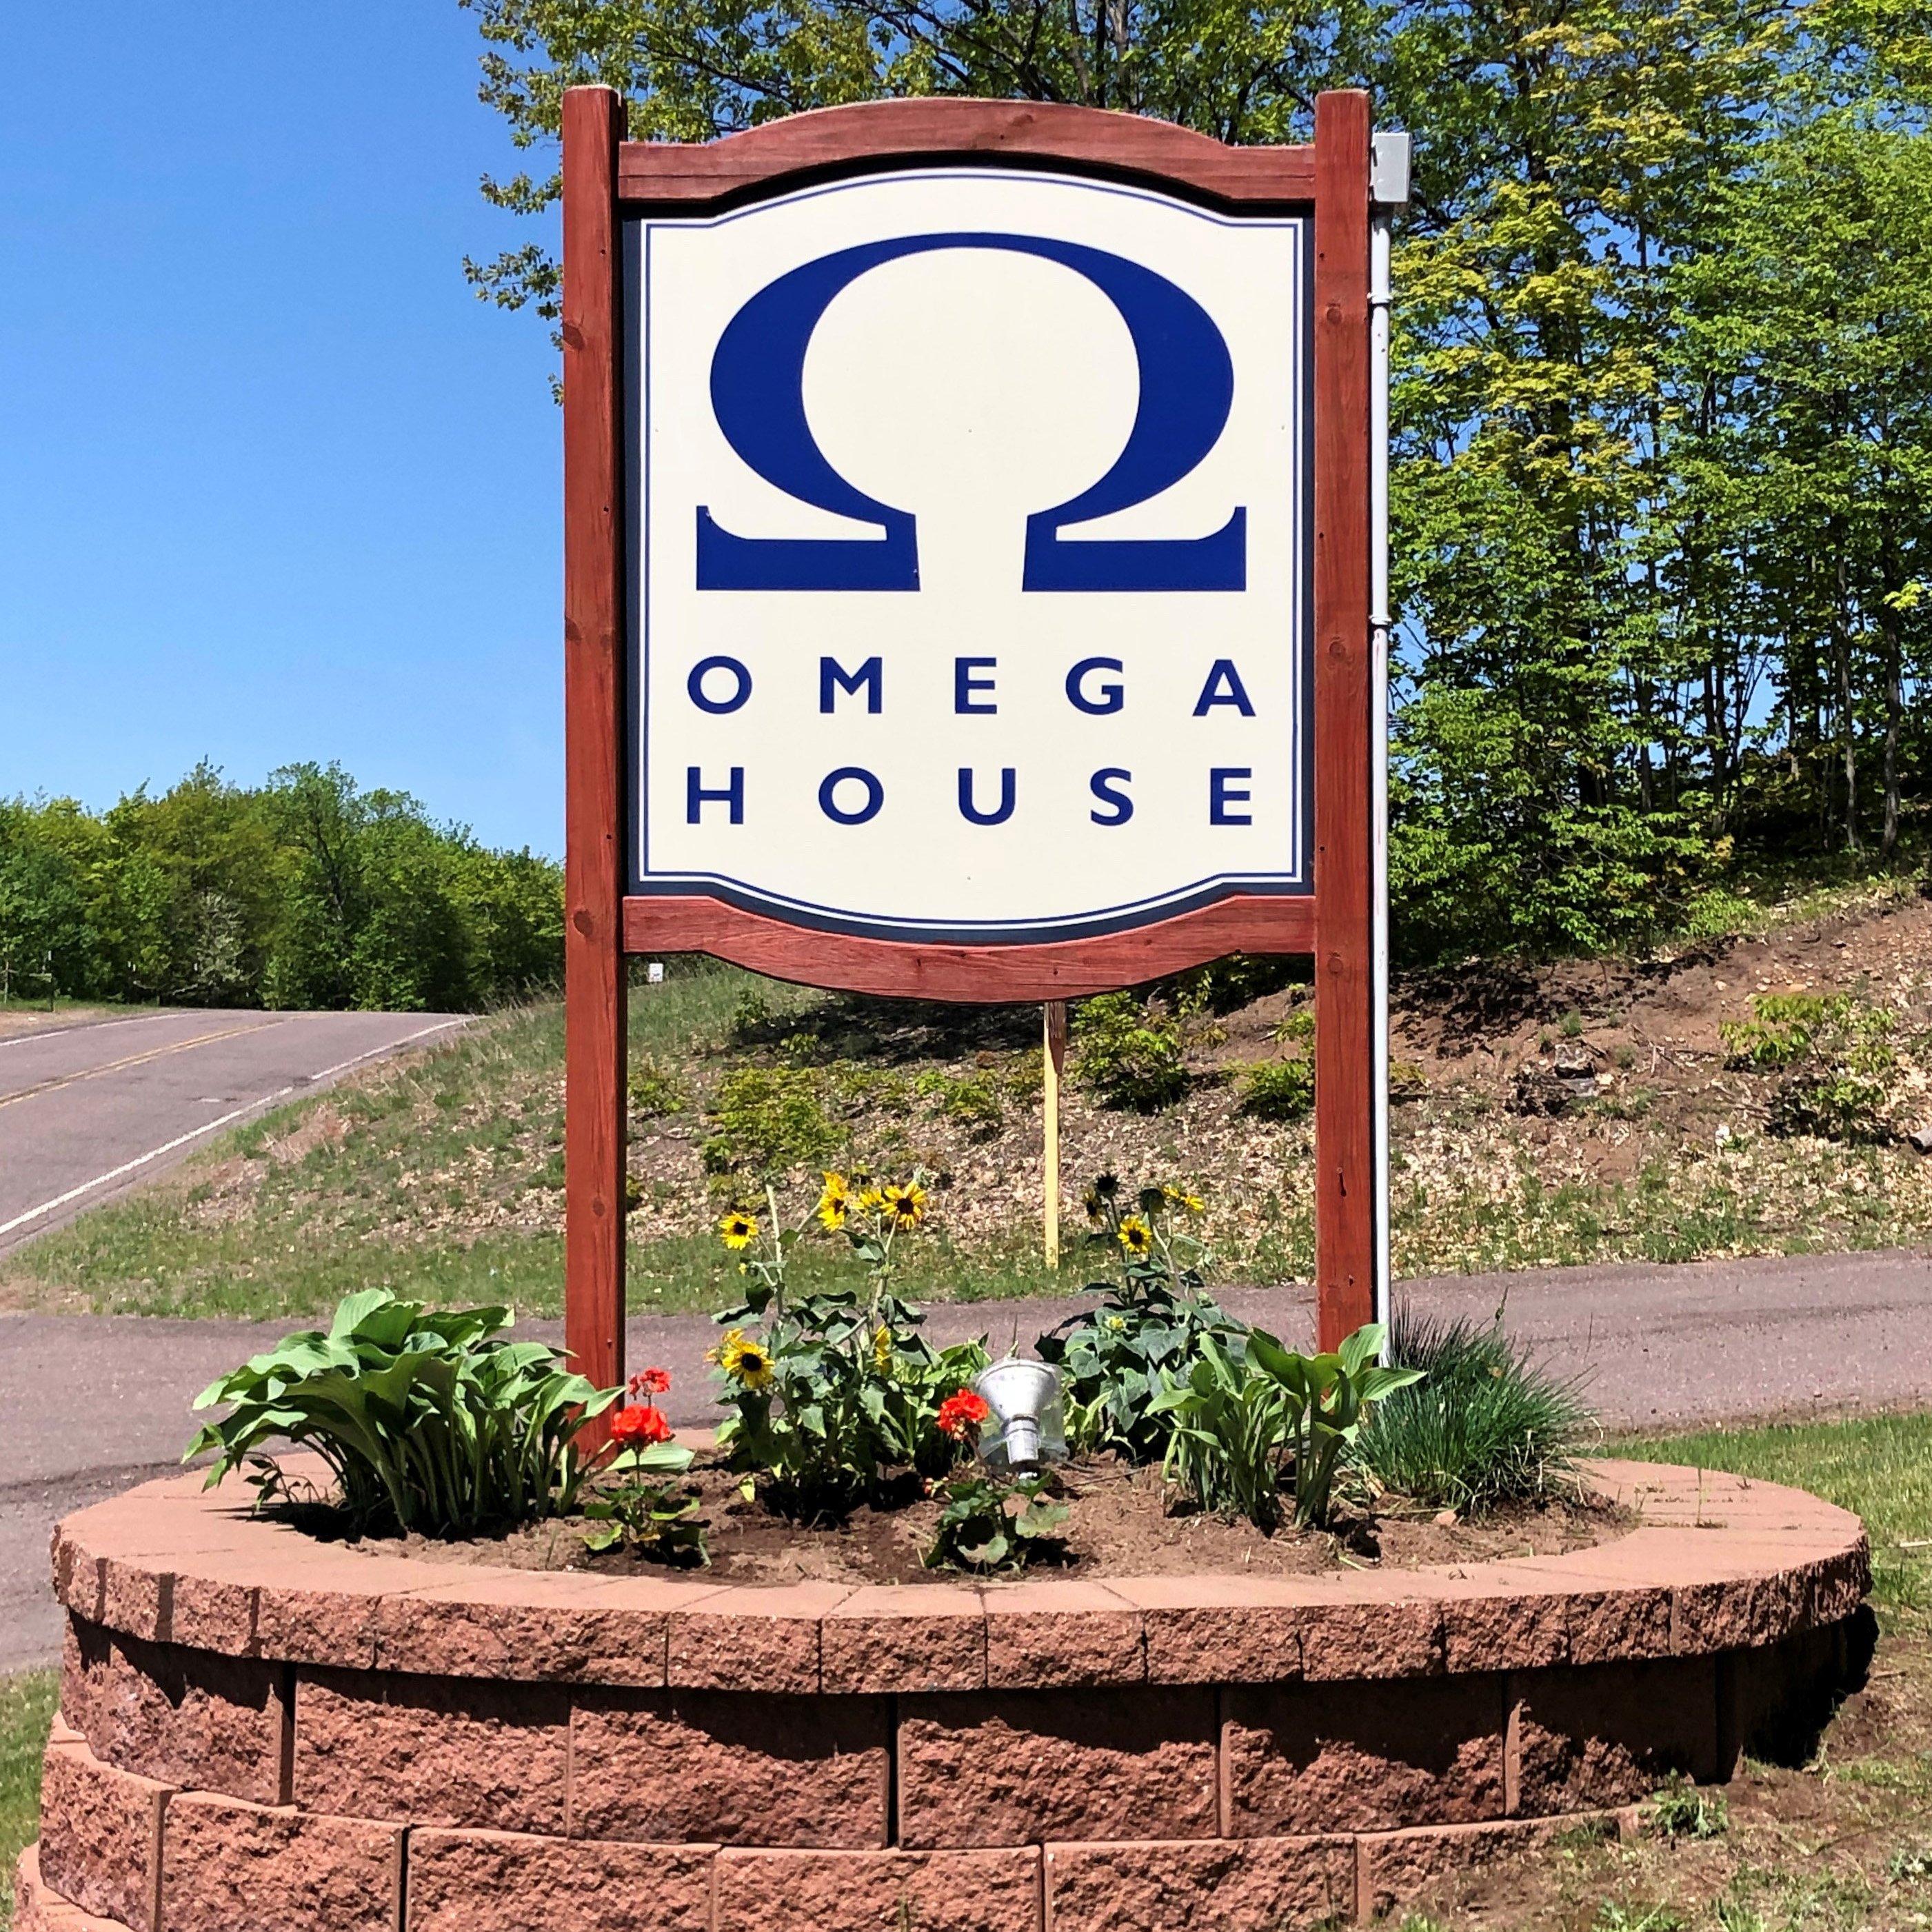 Omega House Square